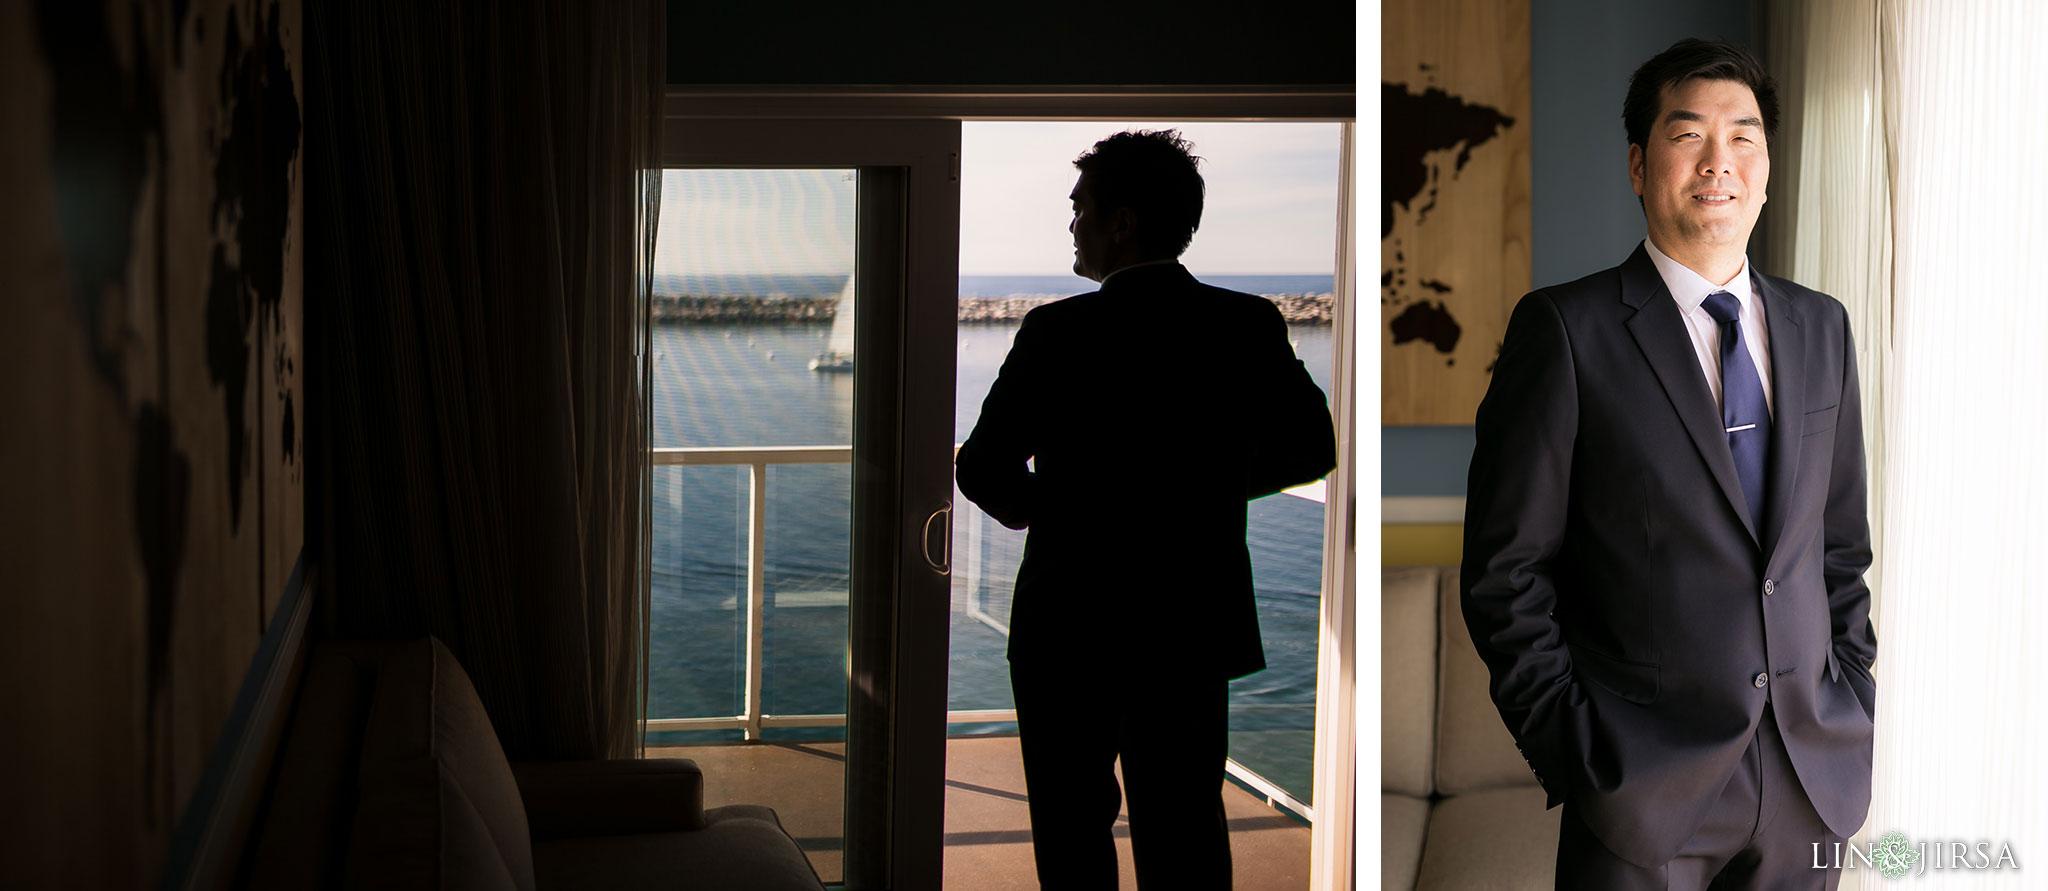 08 portofino hotel redondo beach groom wedding photography